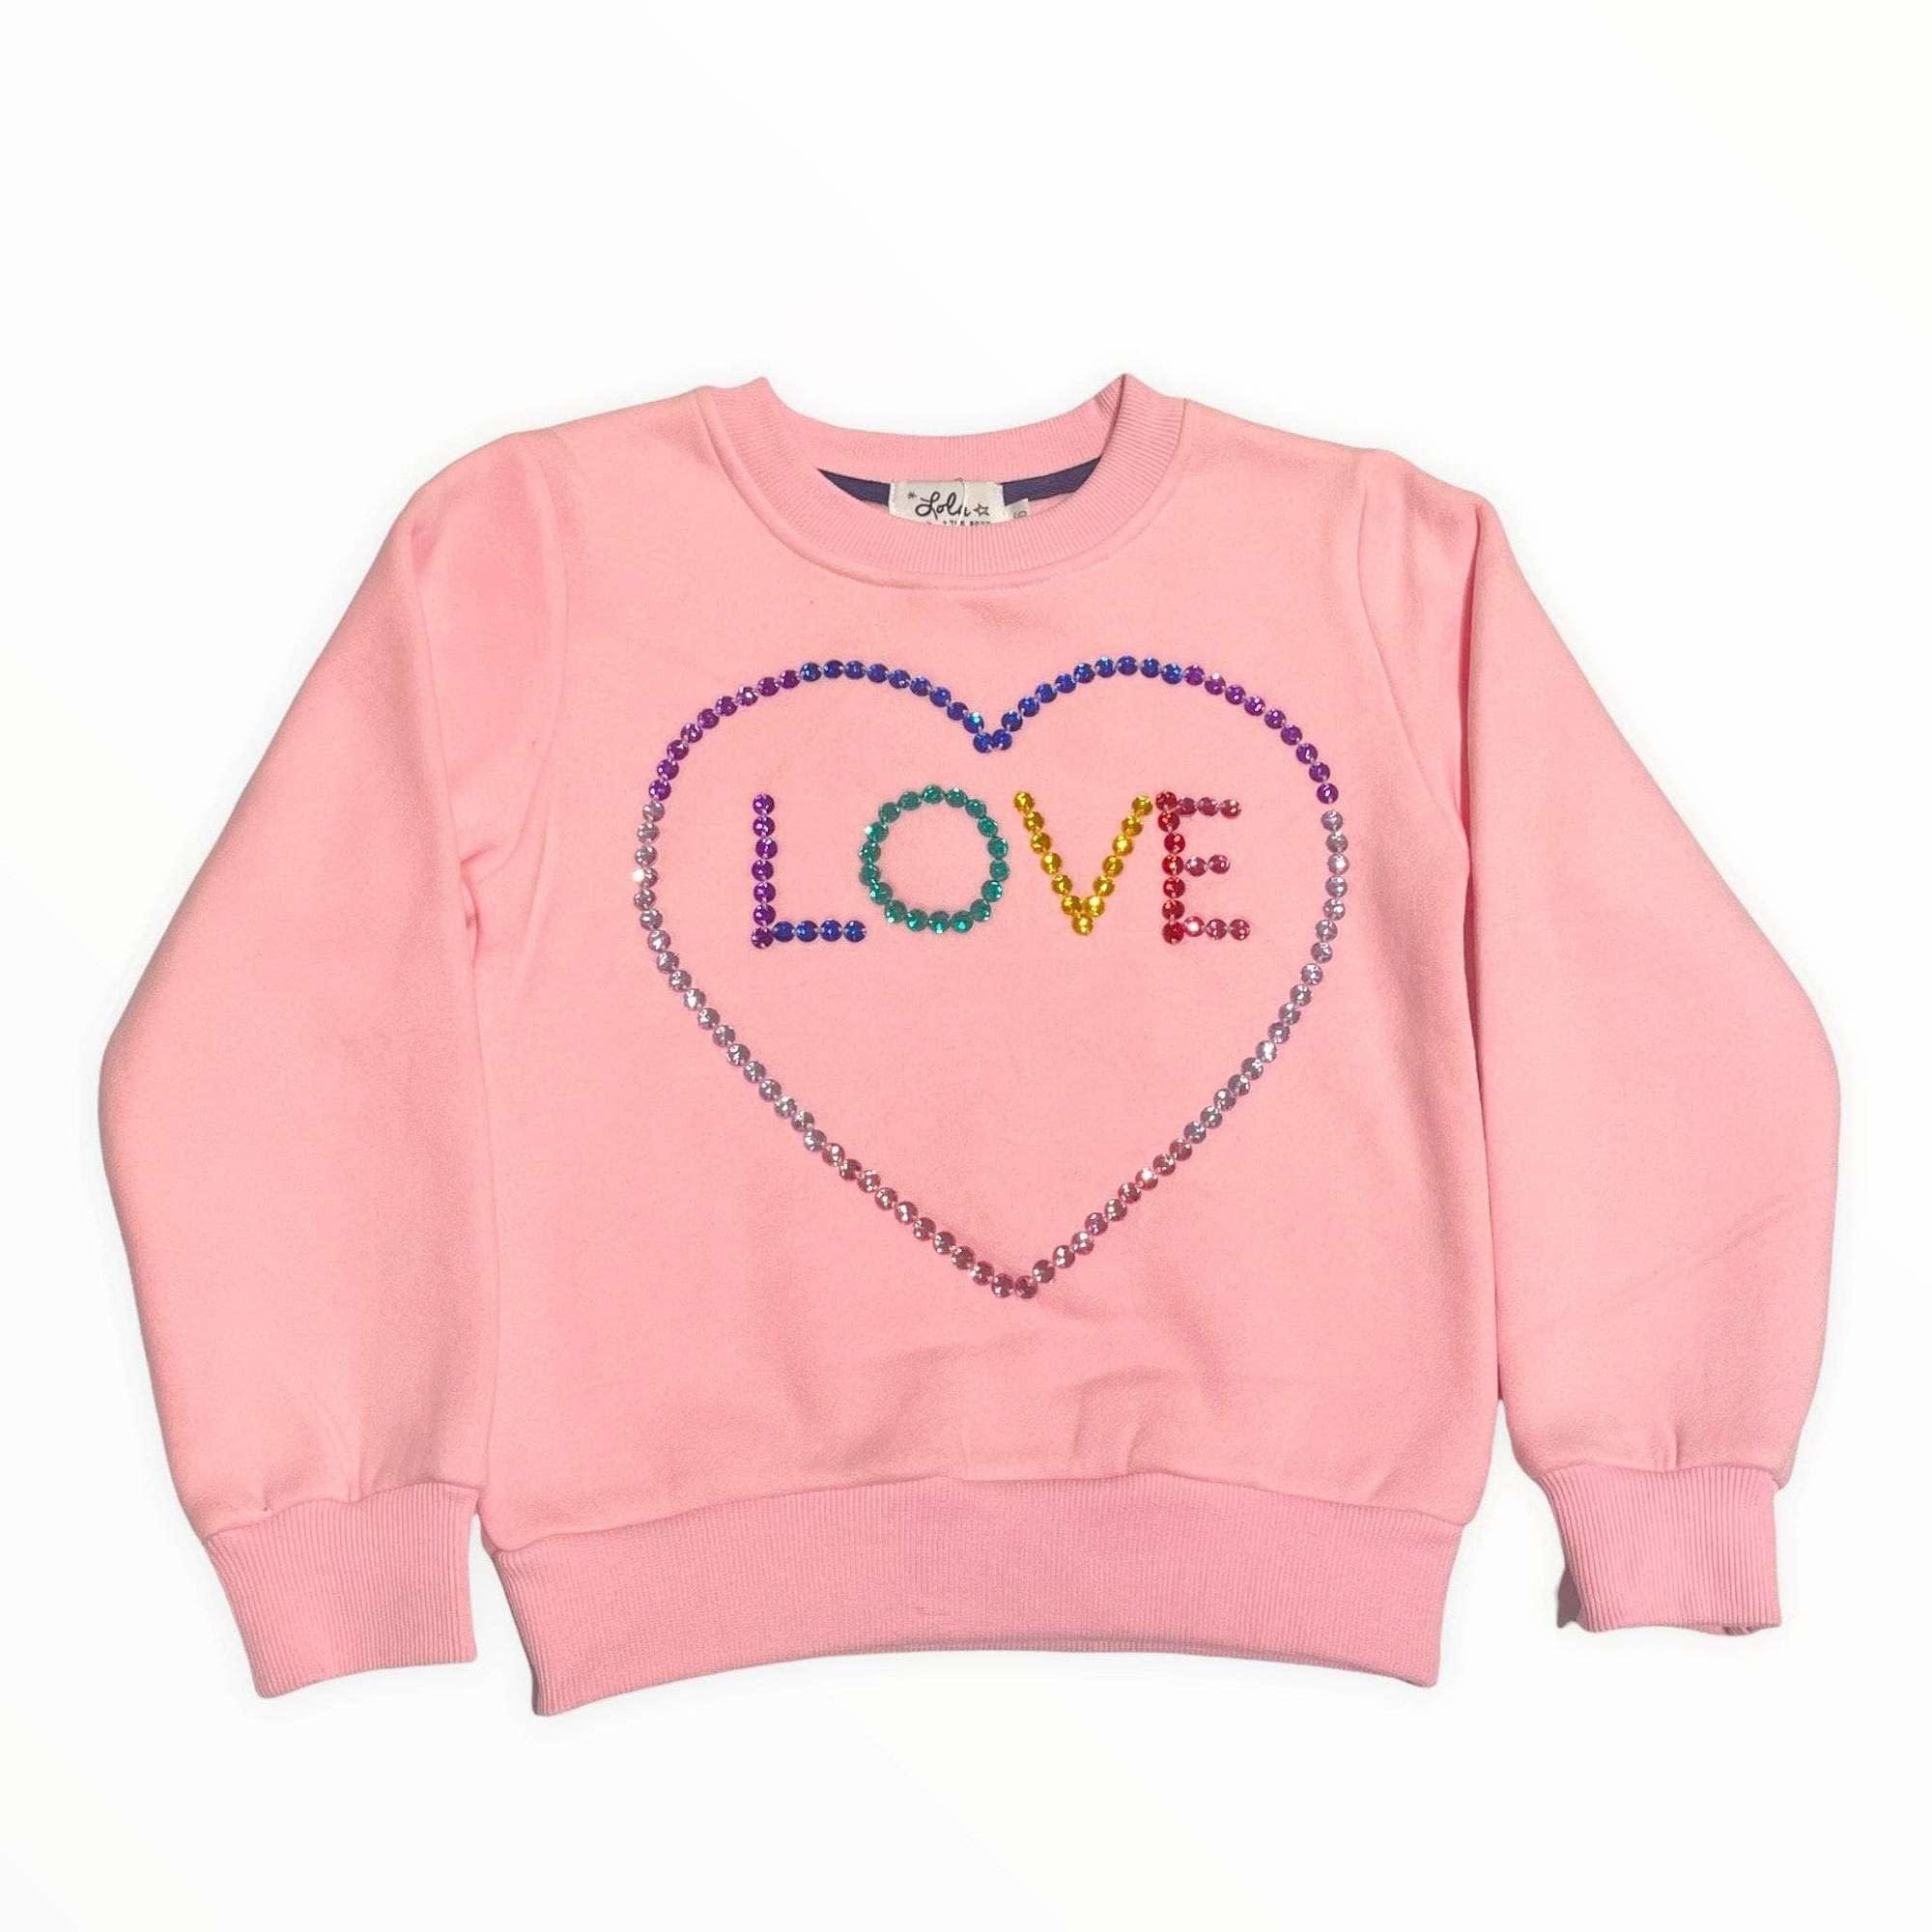 Lola & the Boys Light Bright Love Sweatshirt